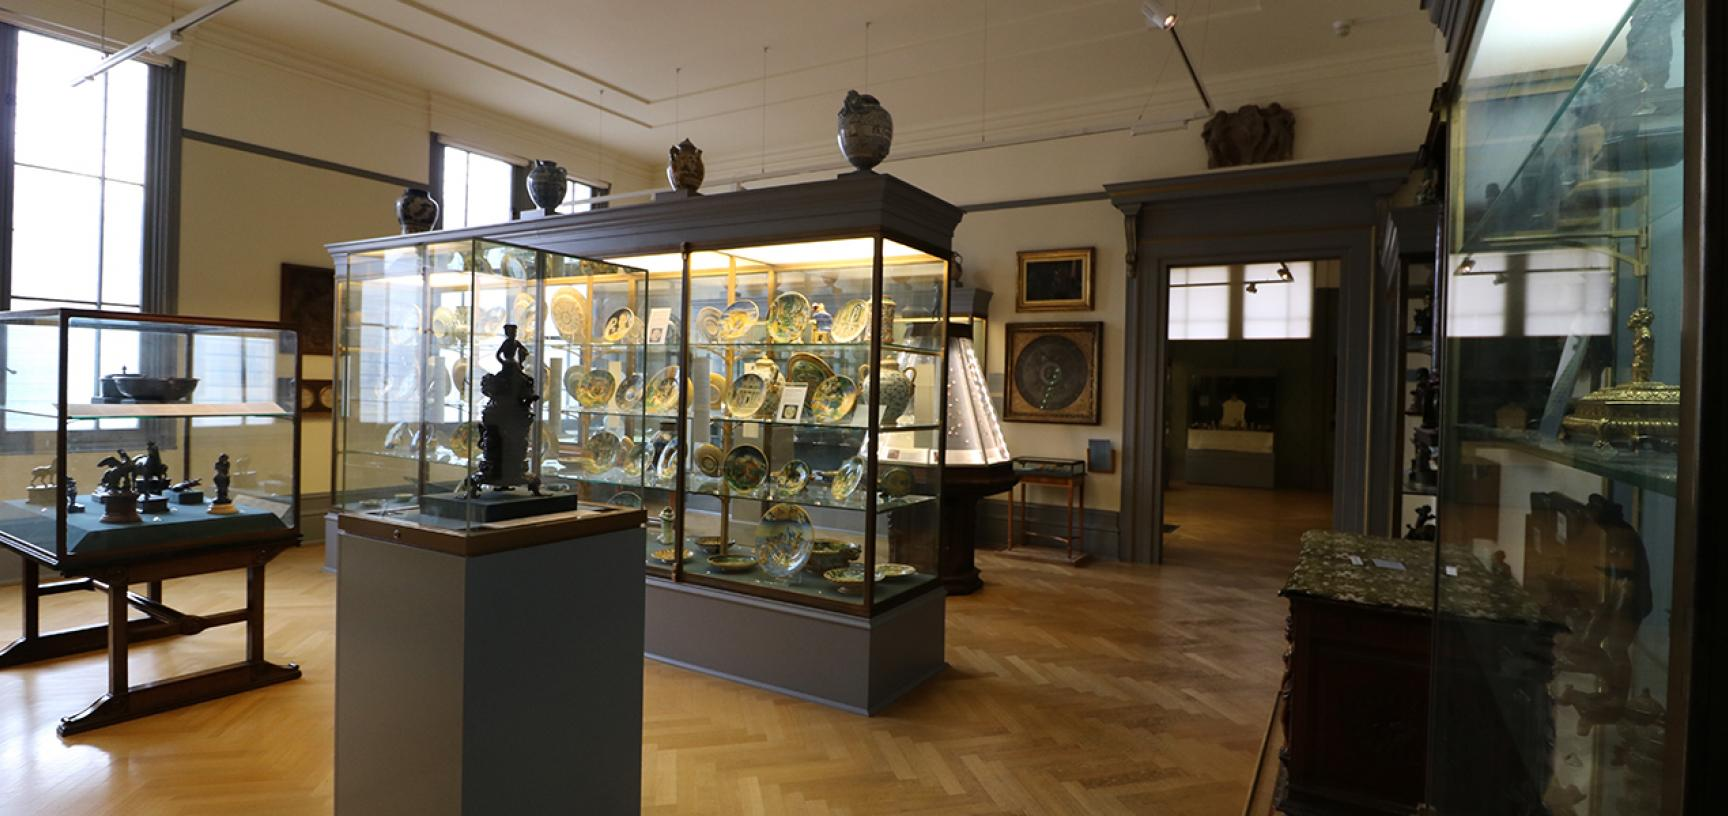 ashmolean arts of the renaissance